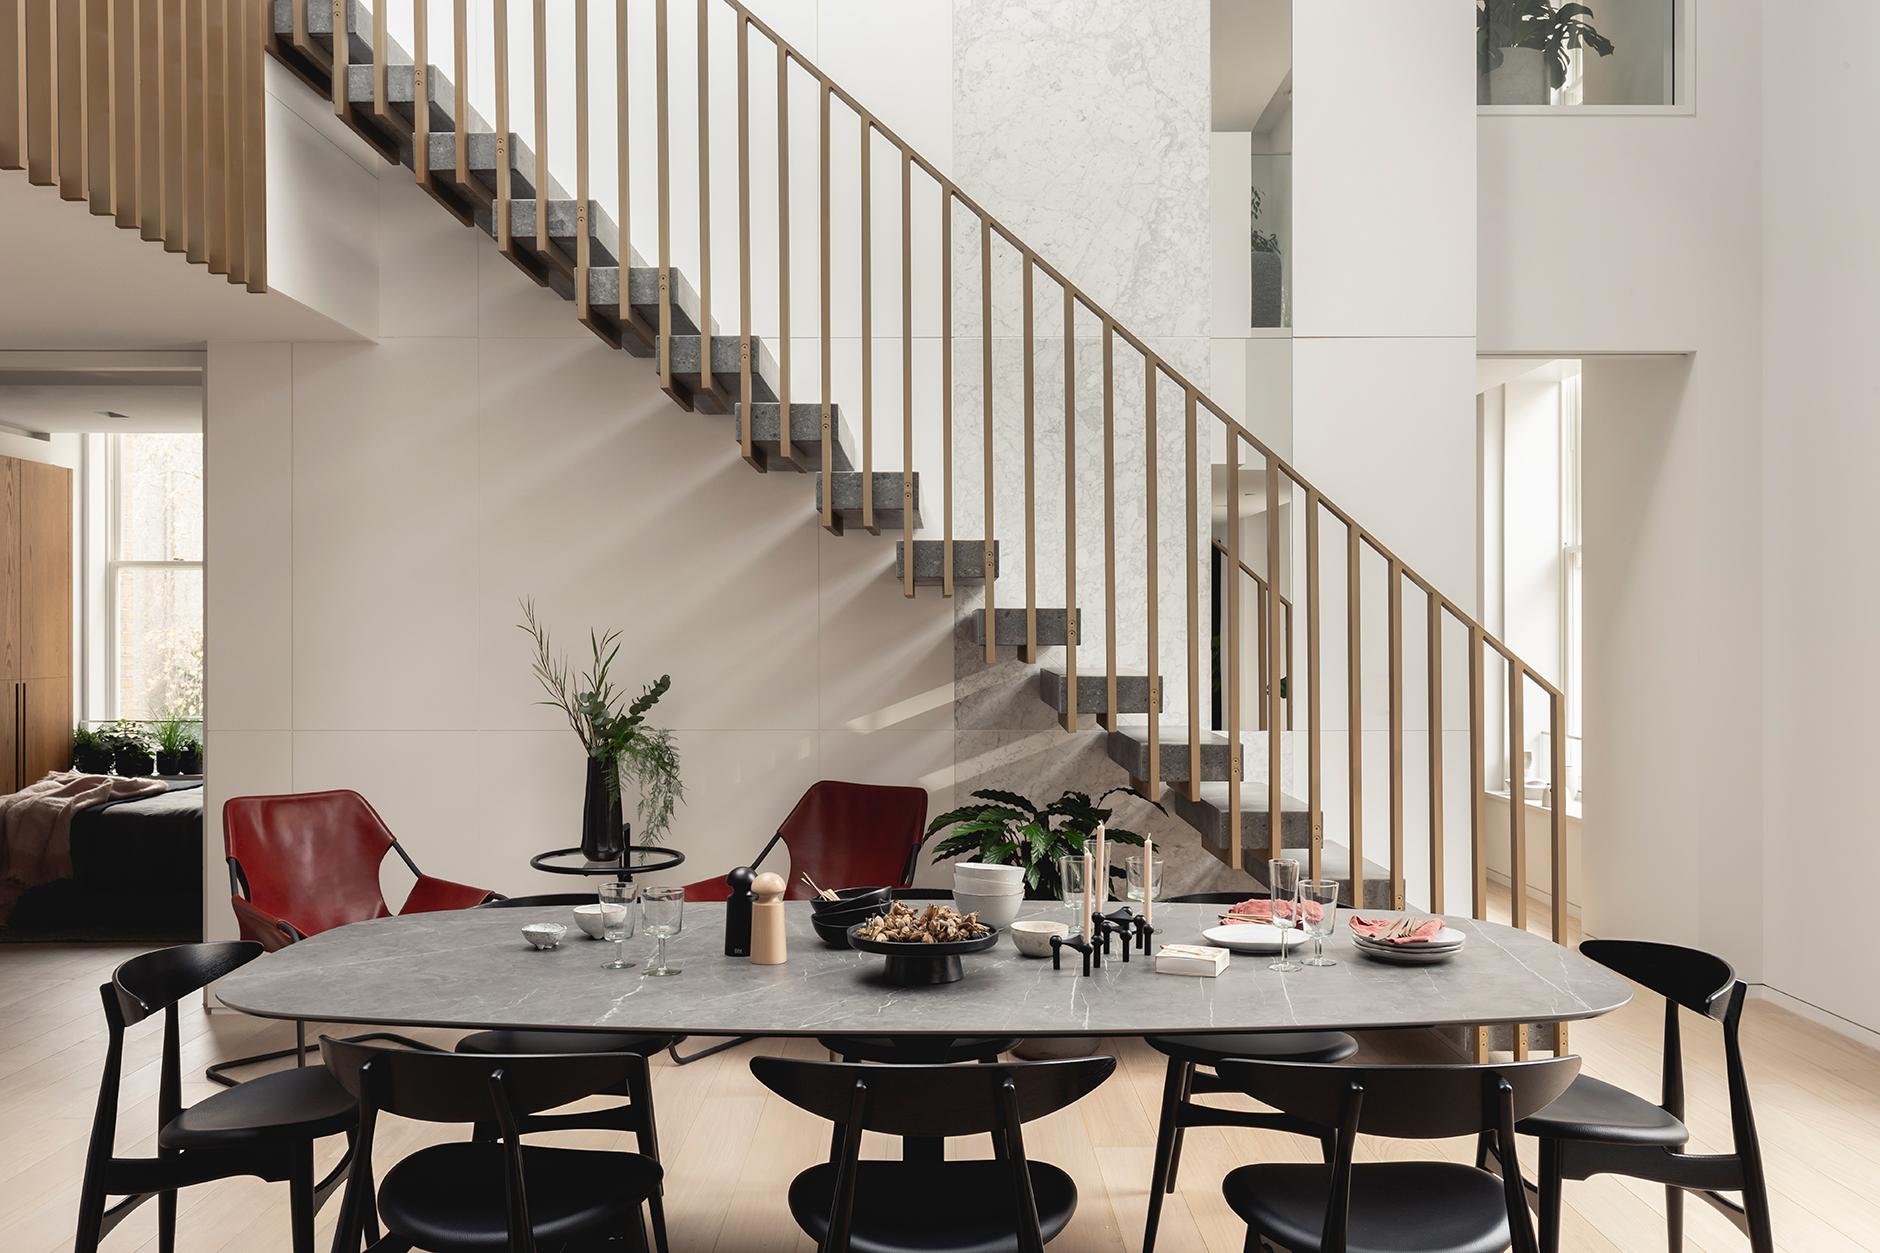 Interior Design Barts Square Hogarth House Dining Room